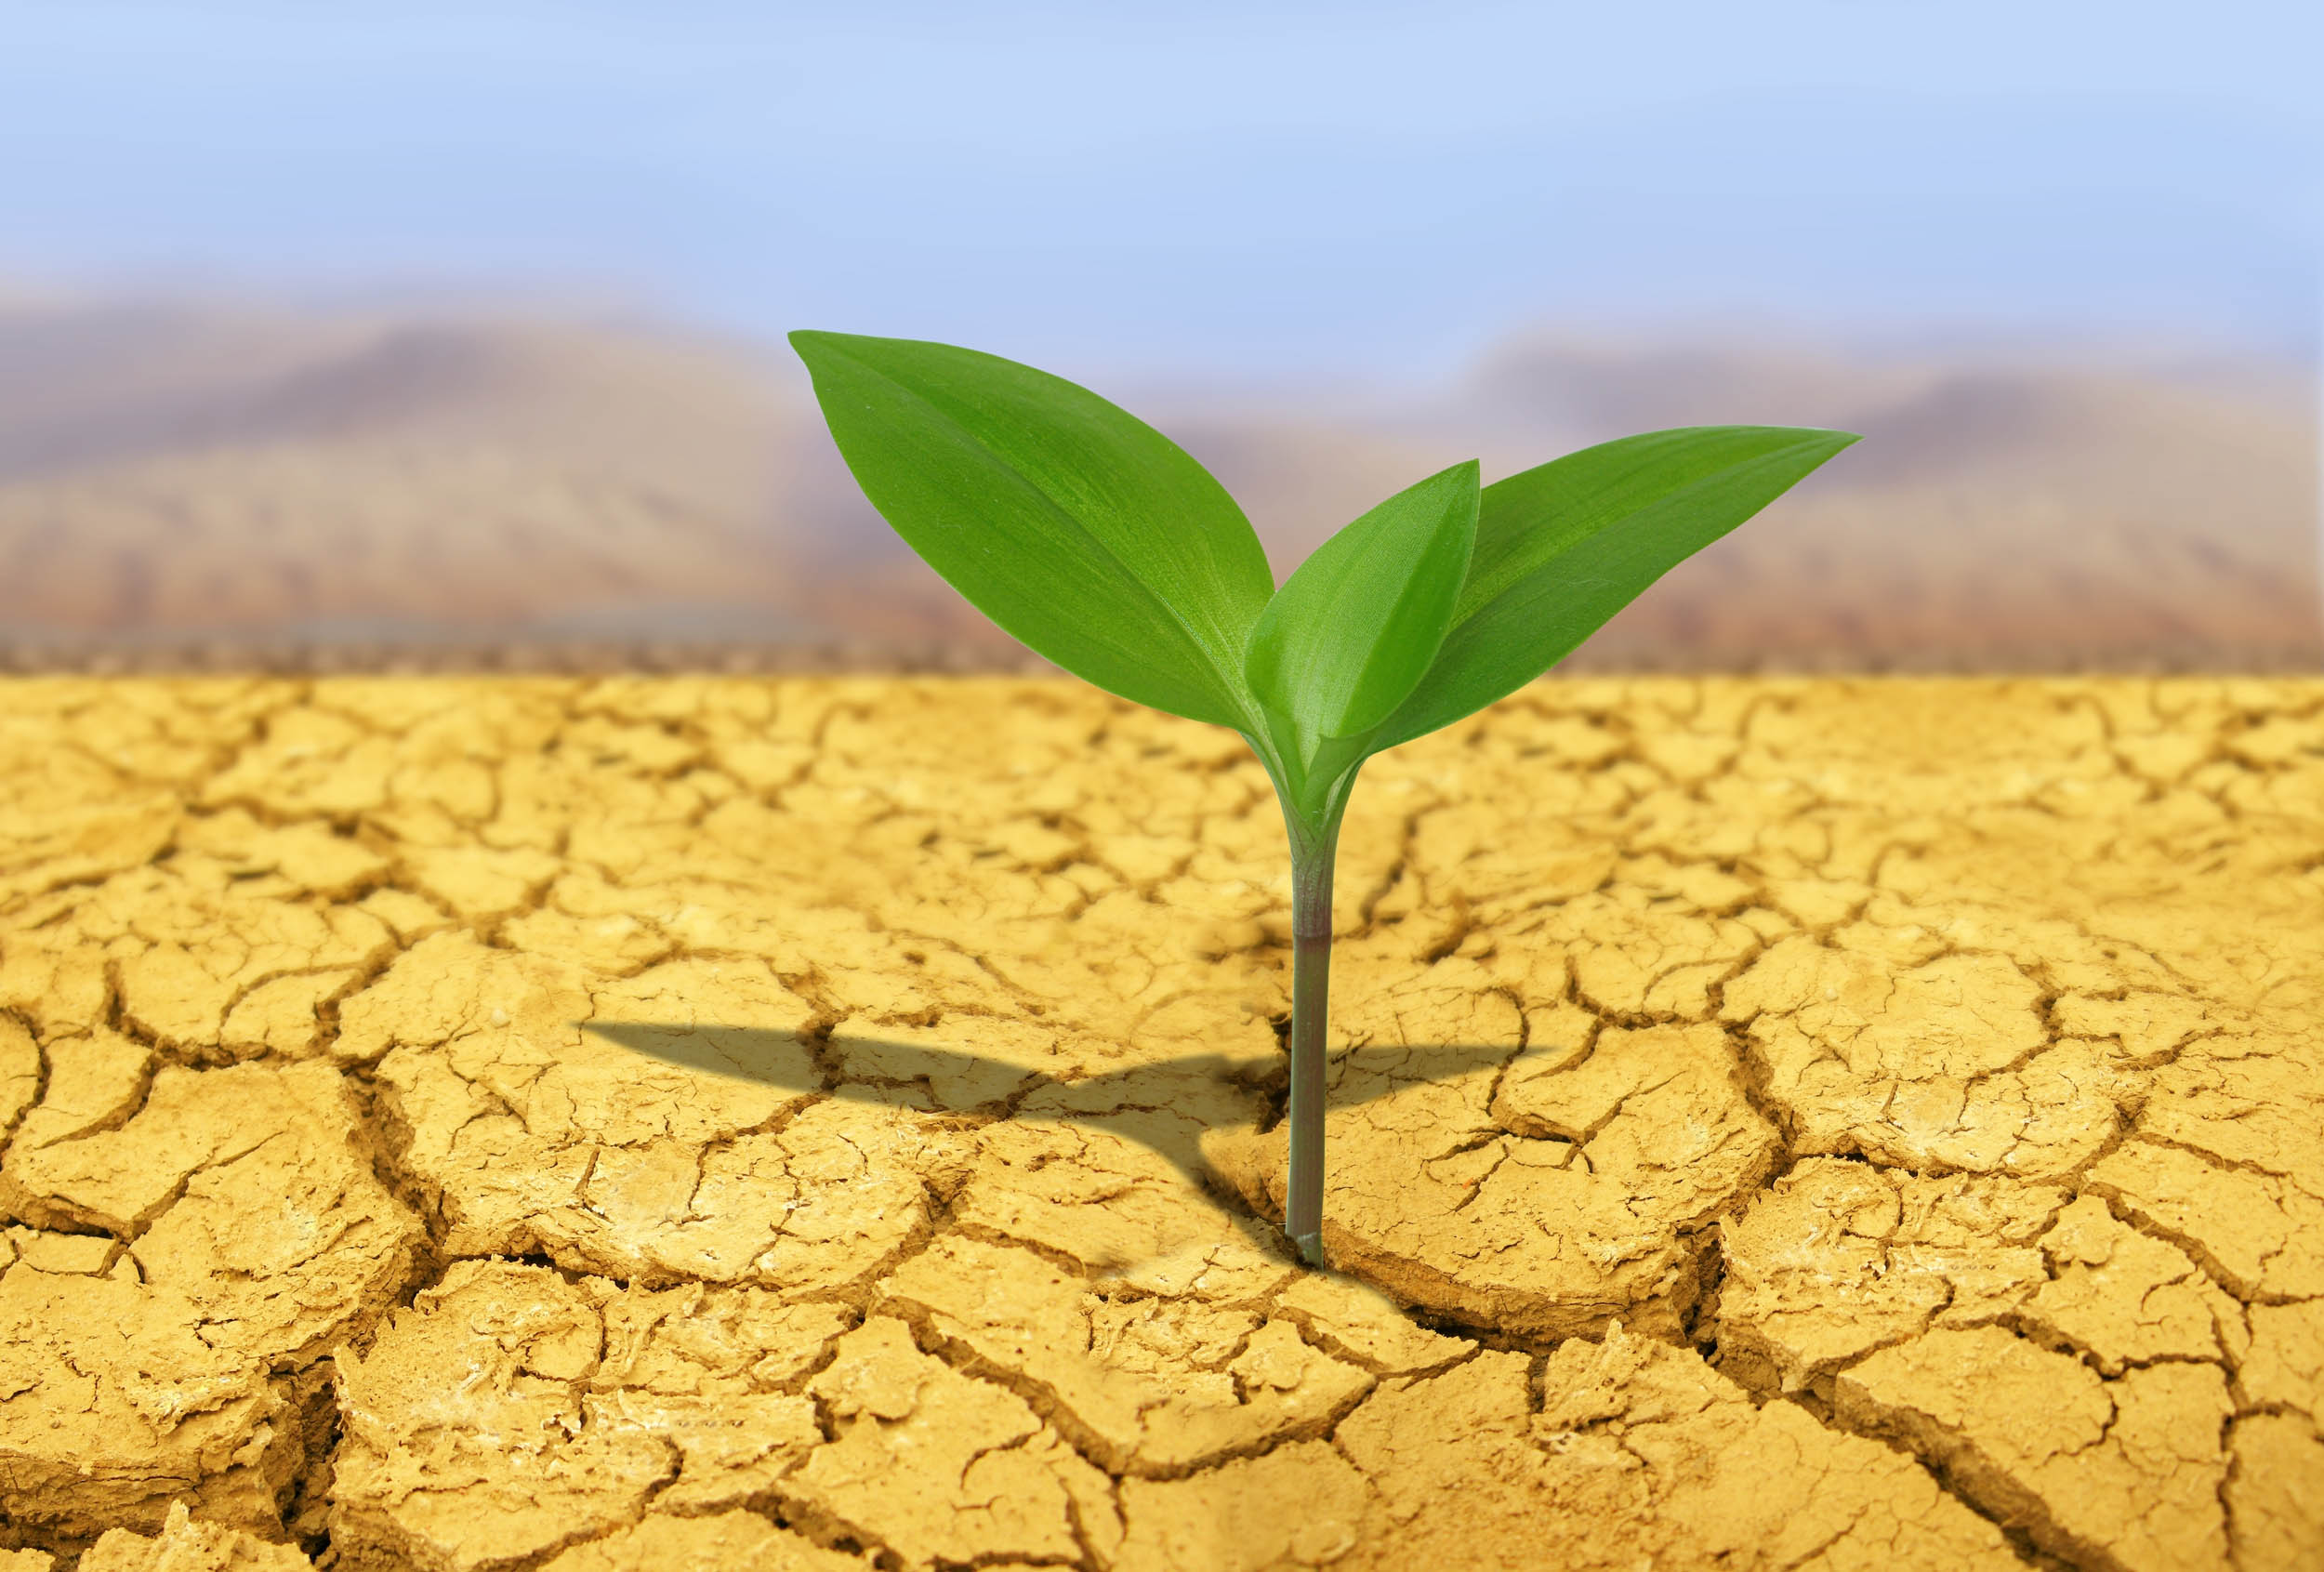 How does leonardite potassium humate improve the plants stress resistance?